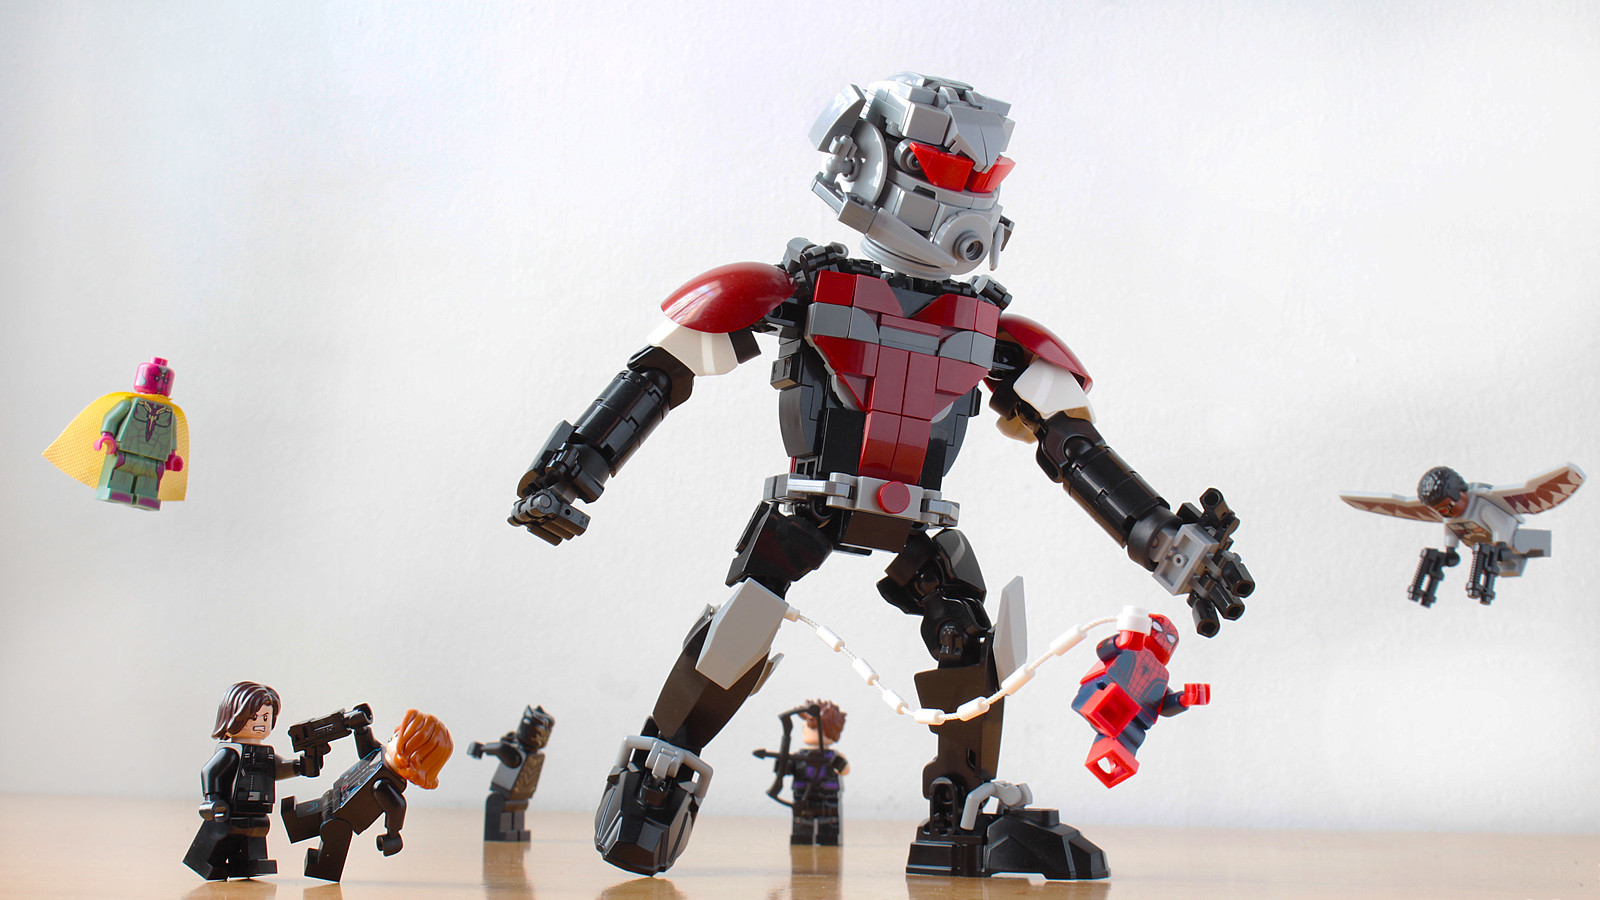 lego-moc-giant-man-hachiroku24 zusammengebaut.com